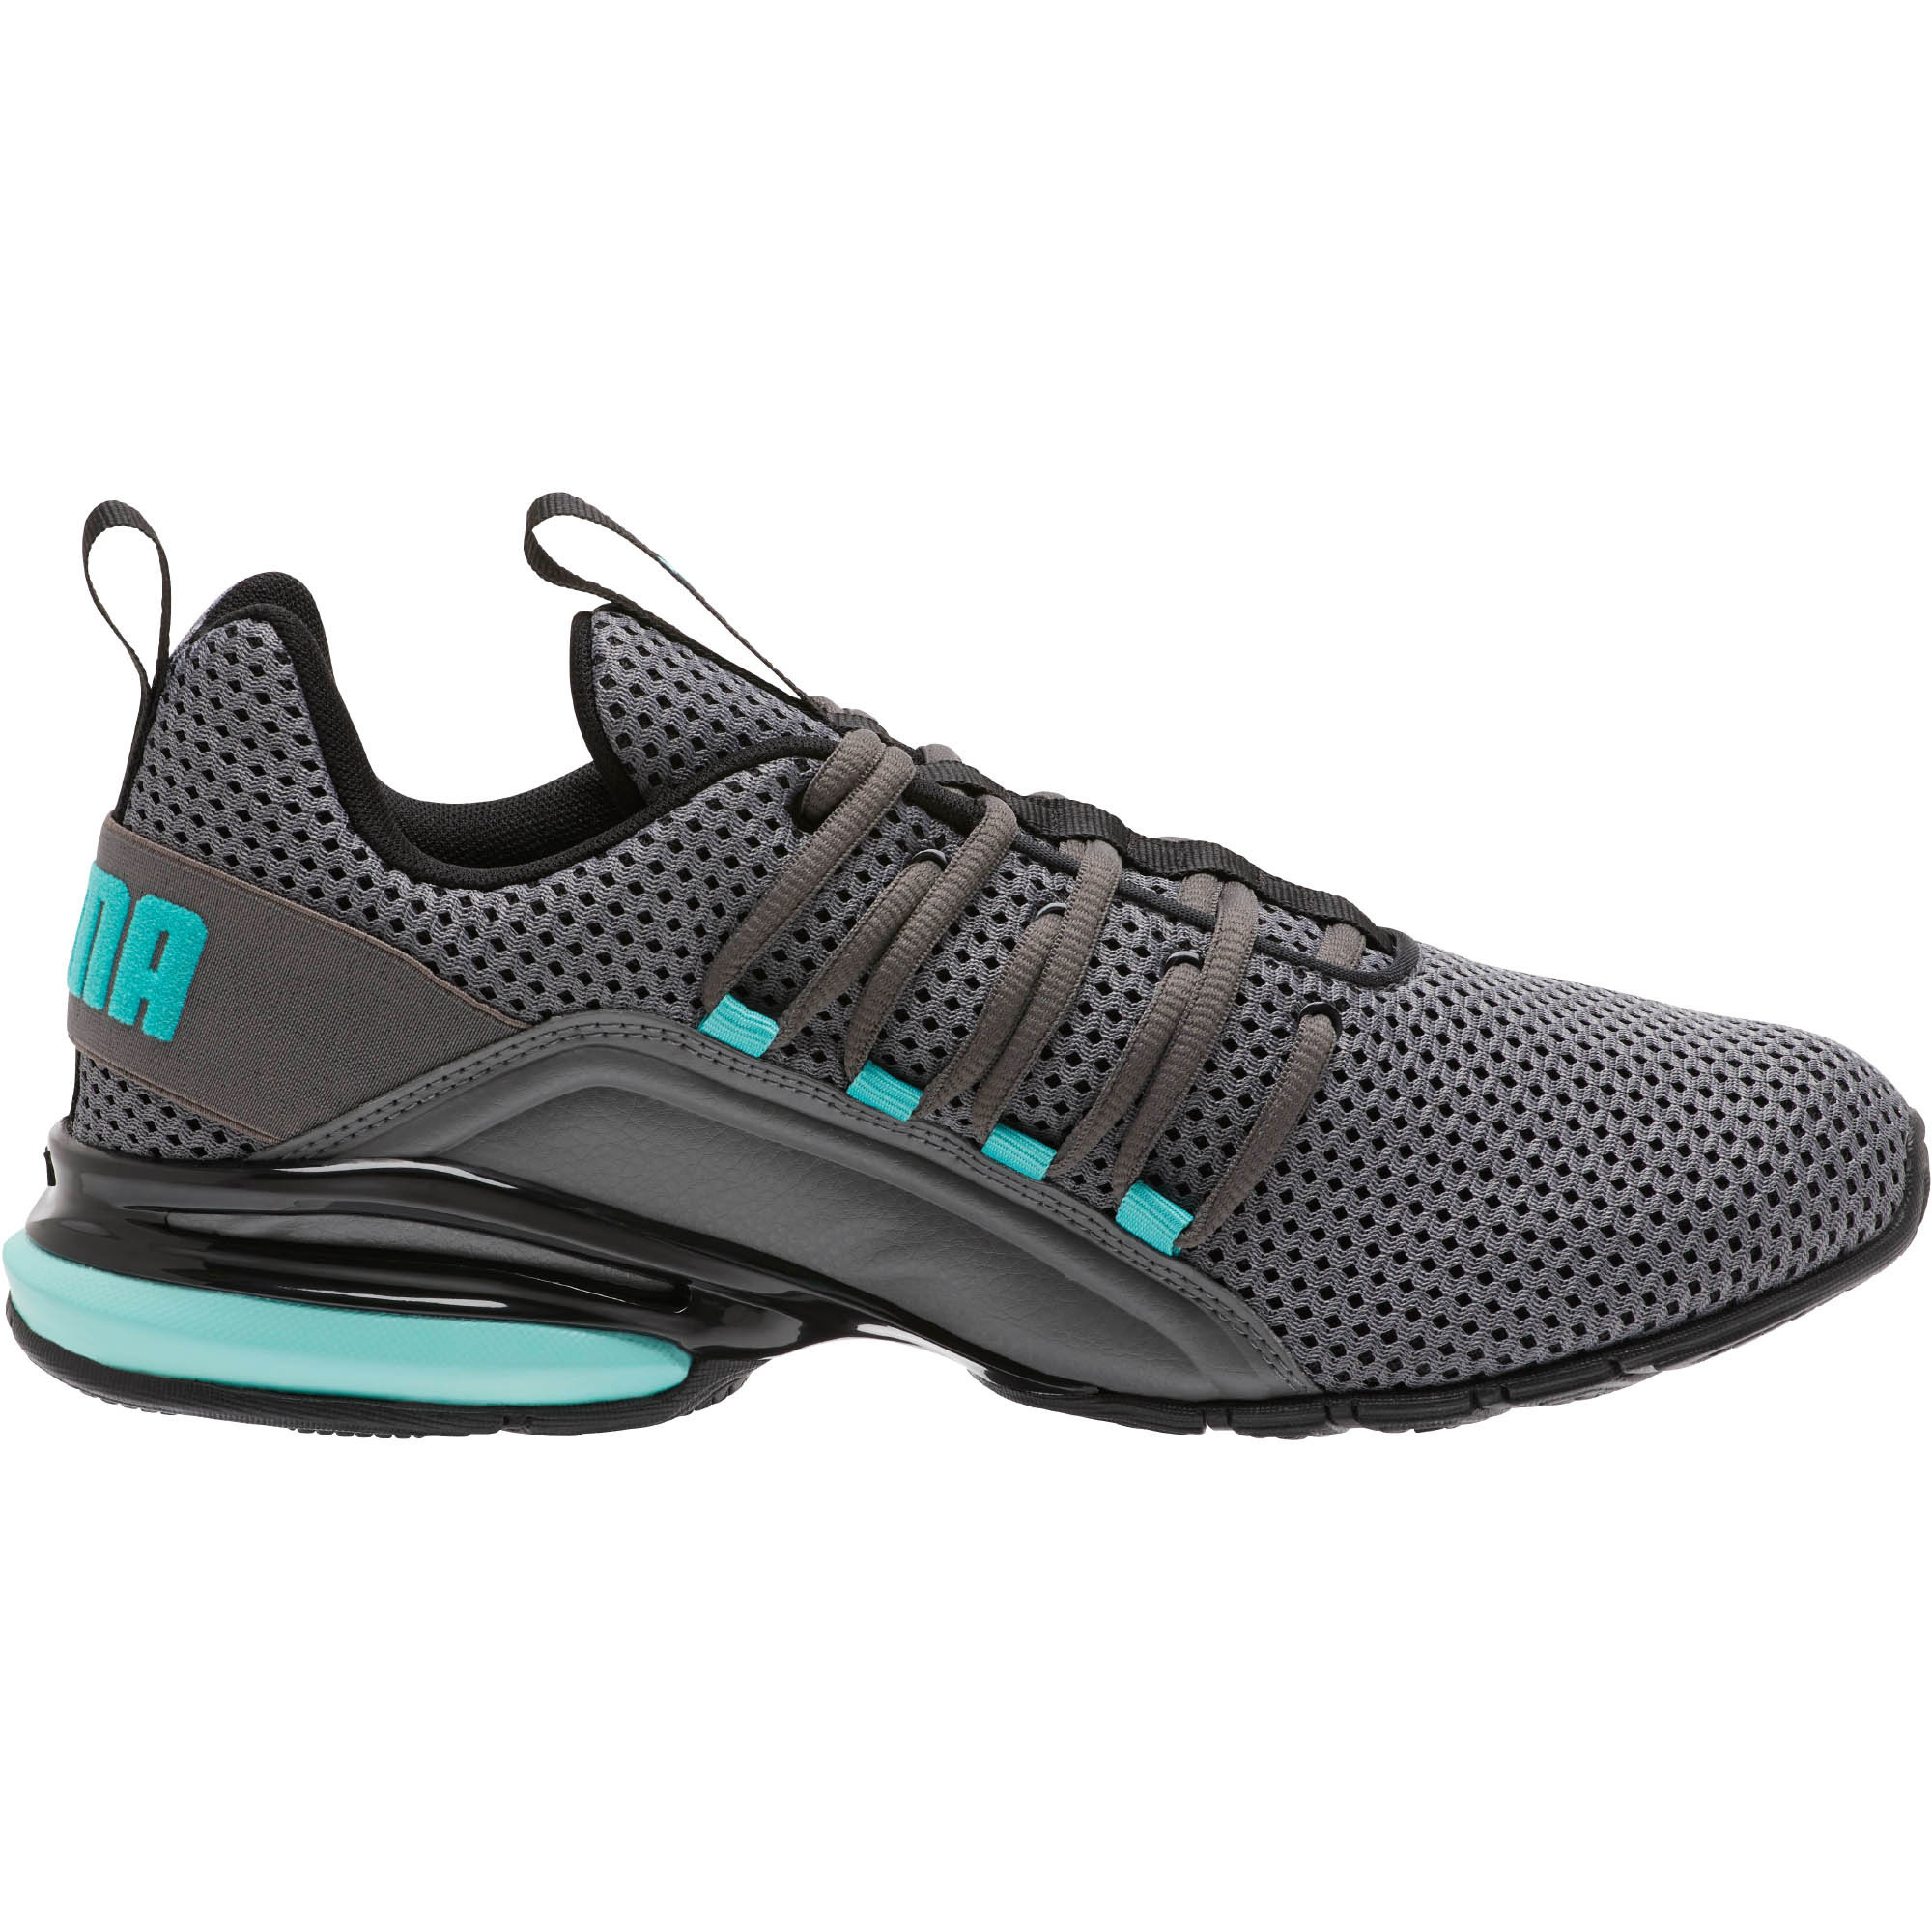 PUMA-Axelion-Breathe-Men-s-Training-Shoes-Men-Shoe-Running thumbnail 10